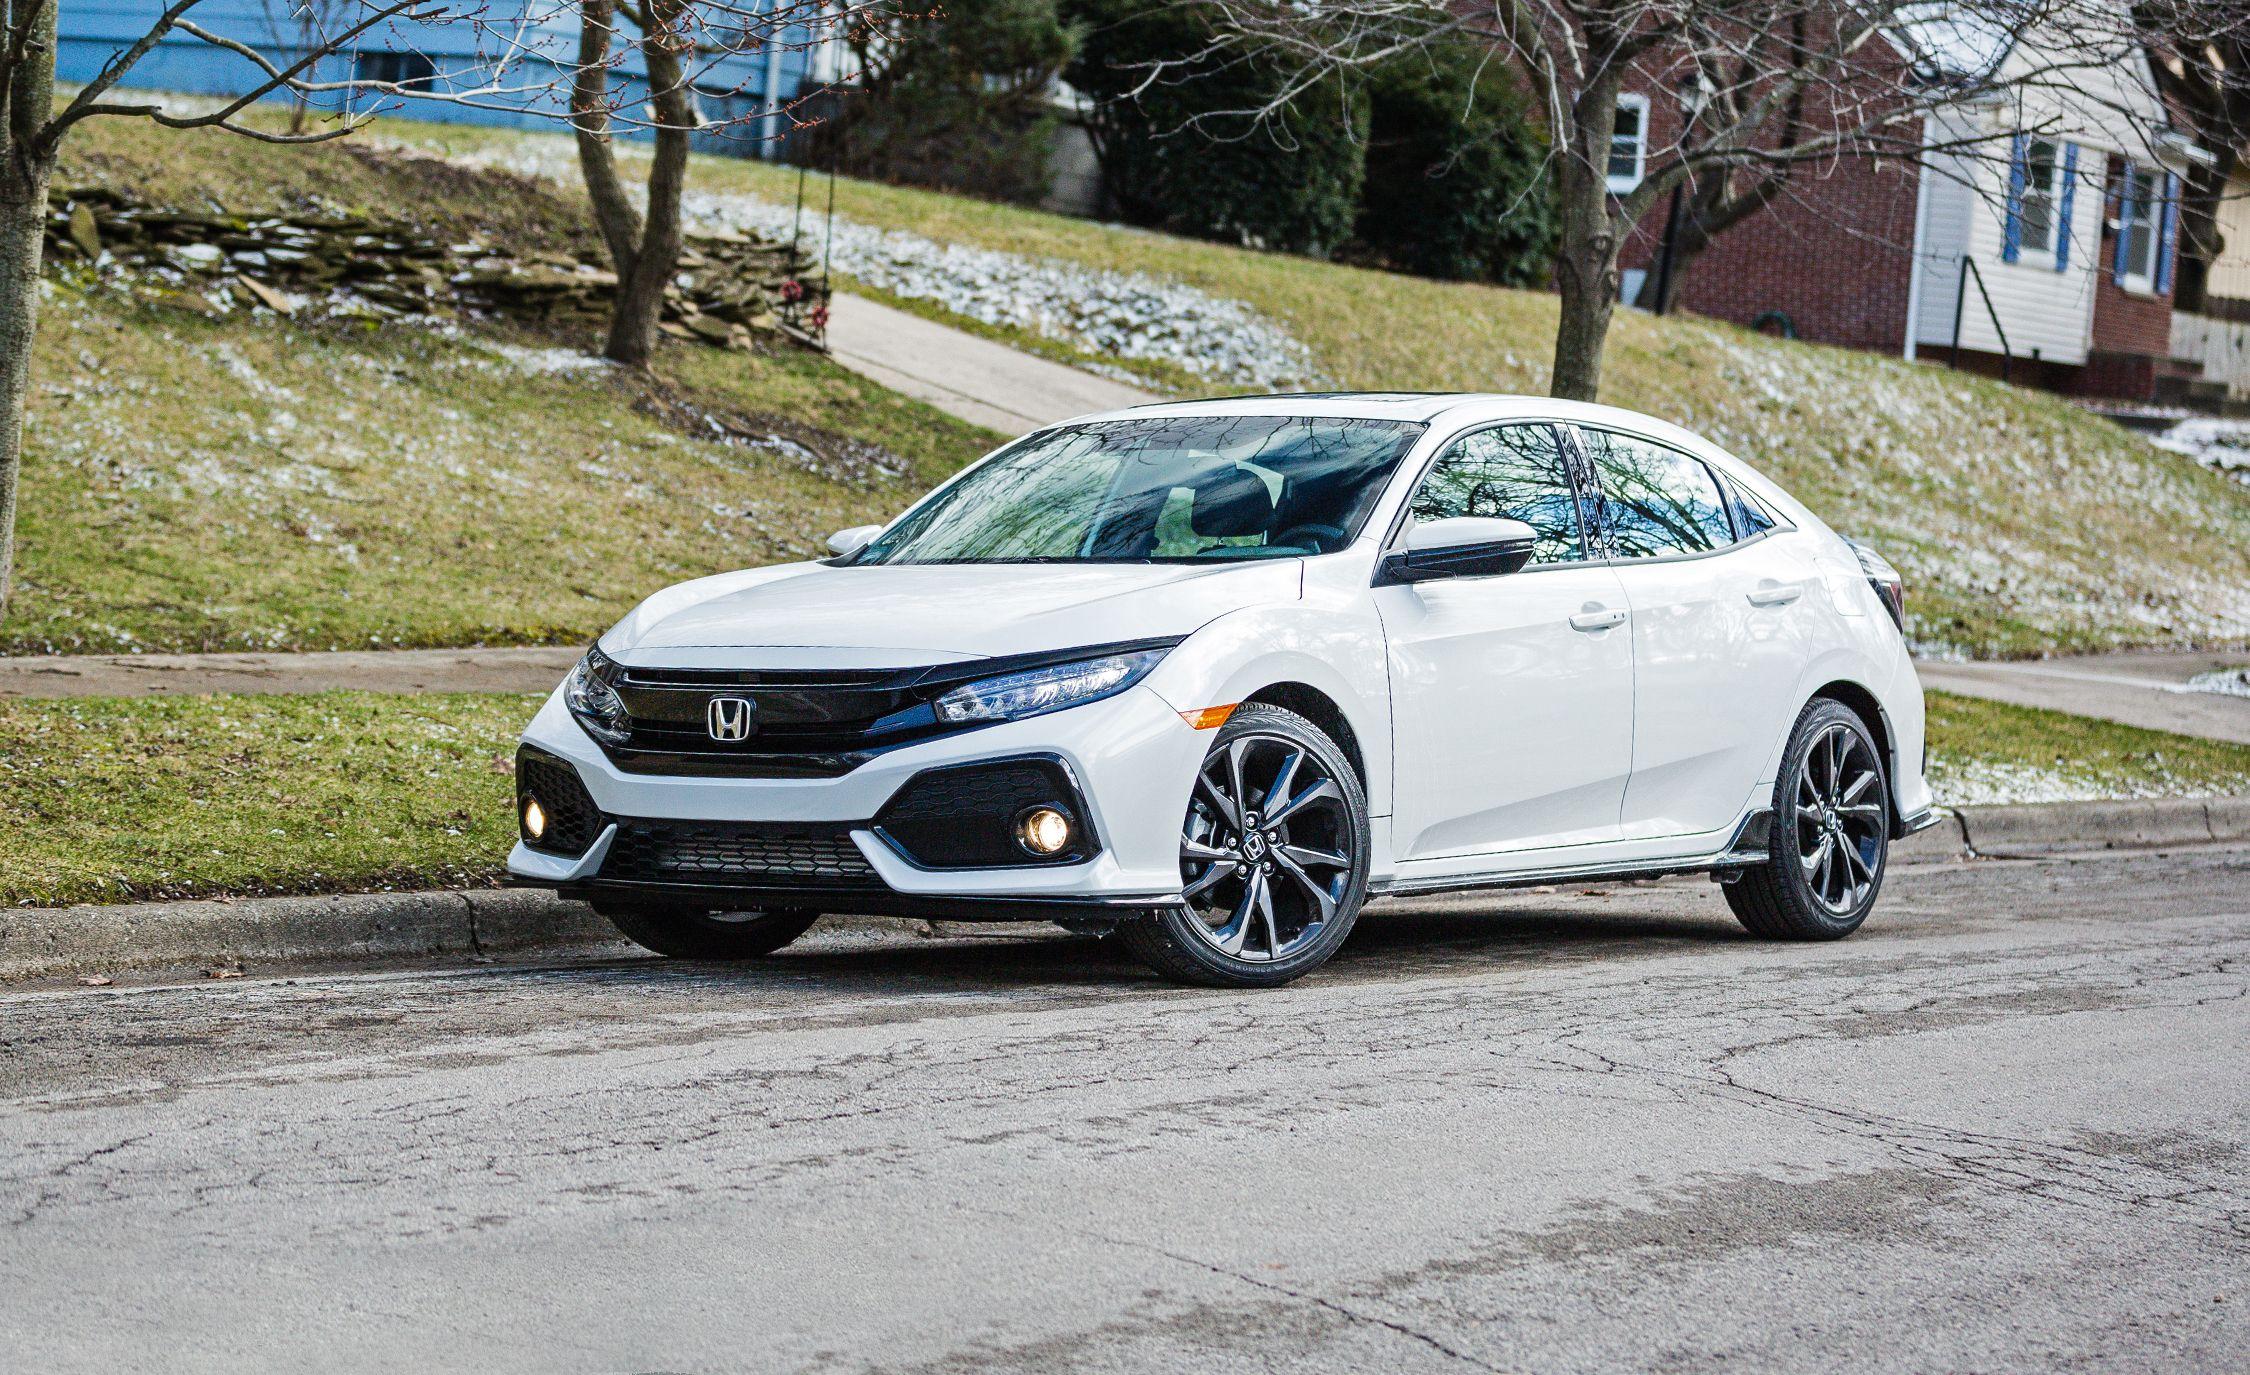 Célèbre Honda Civic Hybrid Pictures | Photo Gallery | Car and Driver NX55